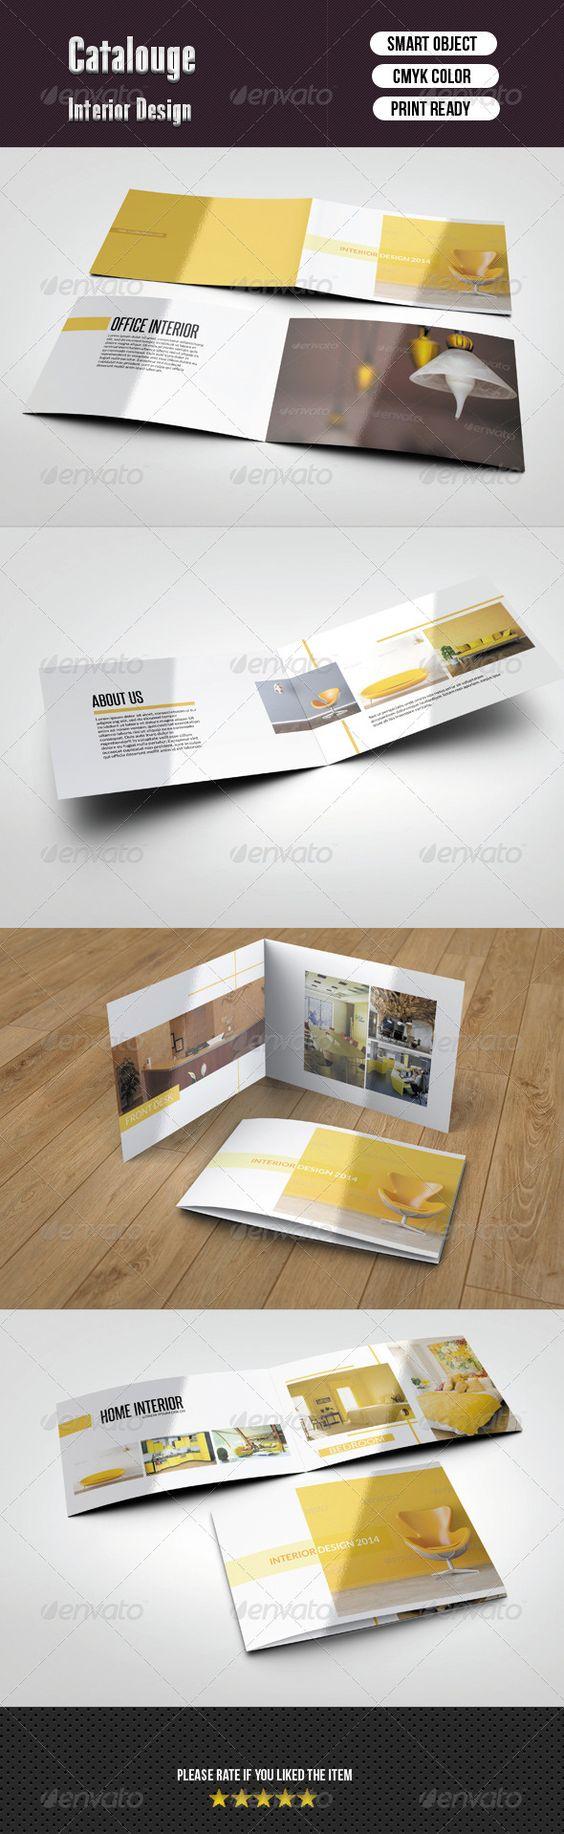 Interior Catalog Furniture Brochures and Catalog design